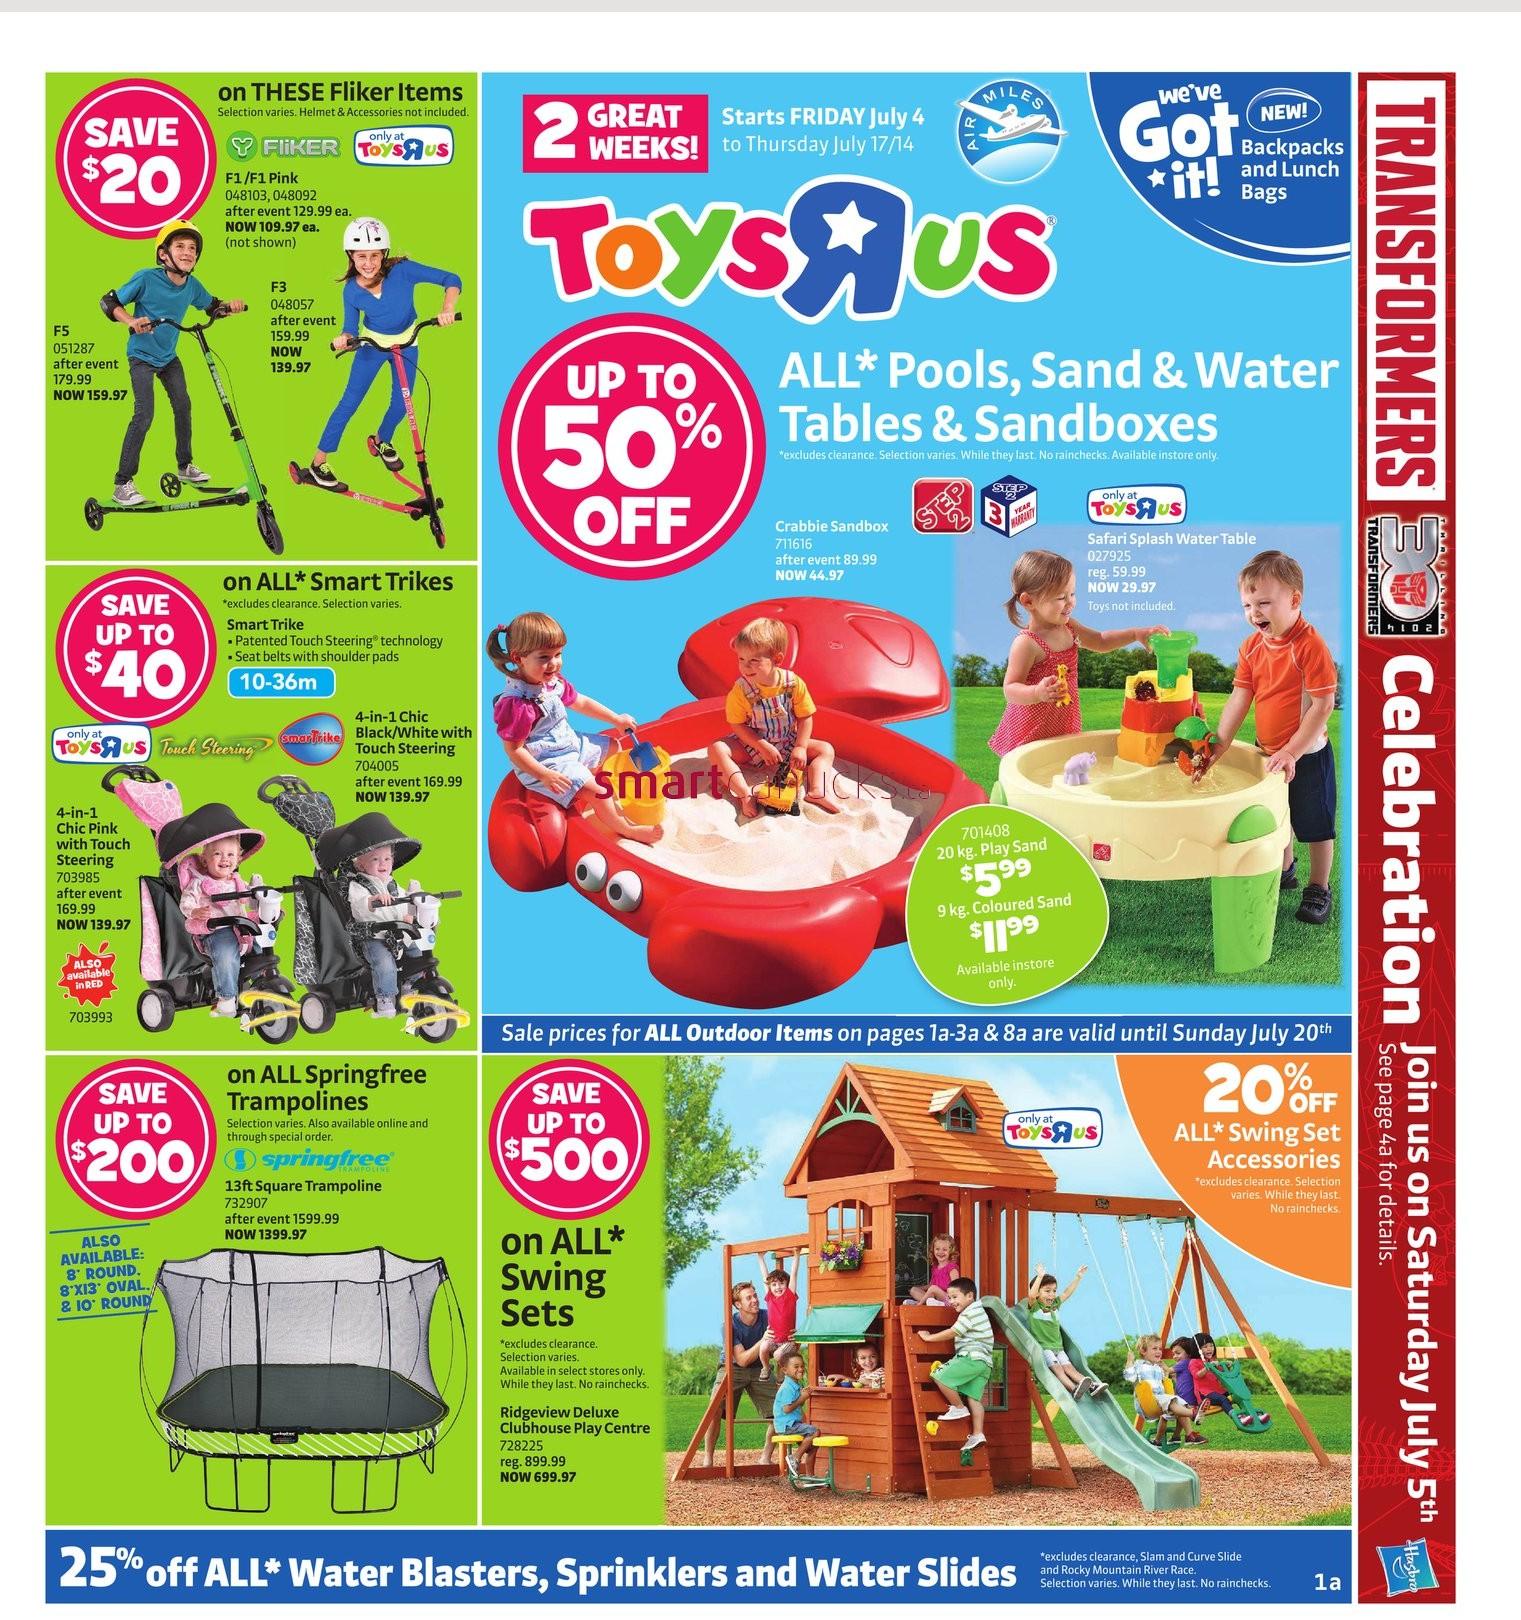 Pool Table Toys R Us Hershey Lodge Coupon Code